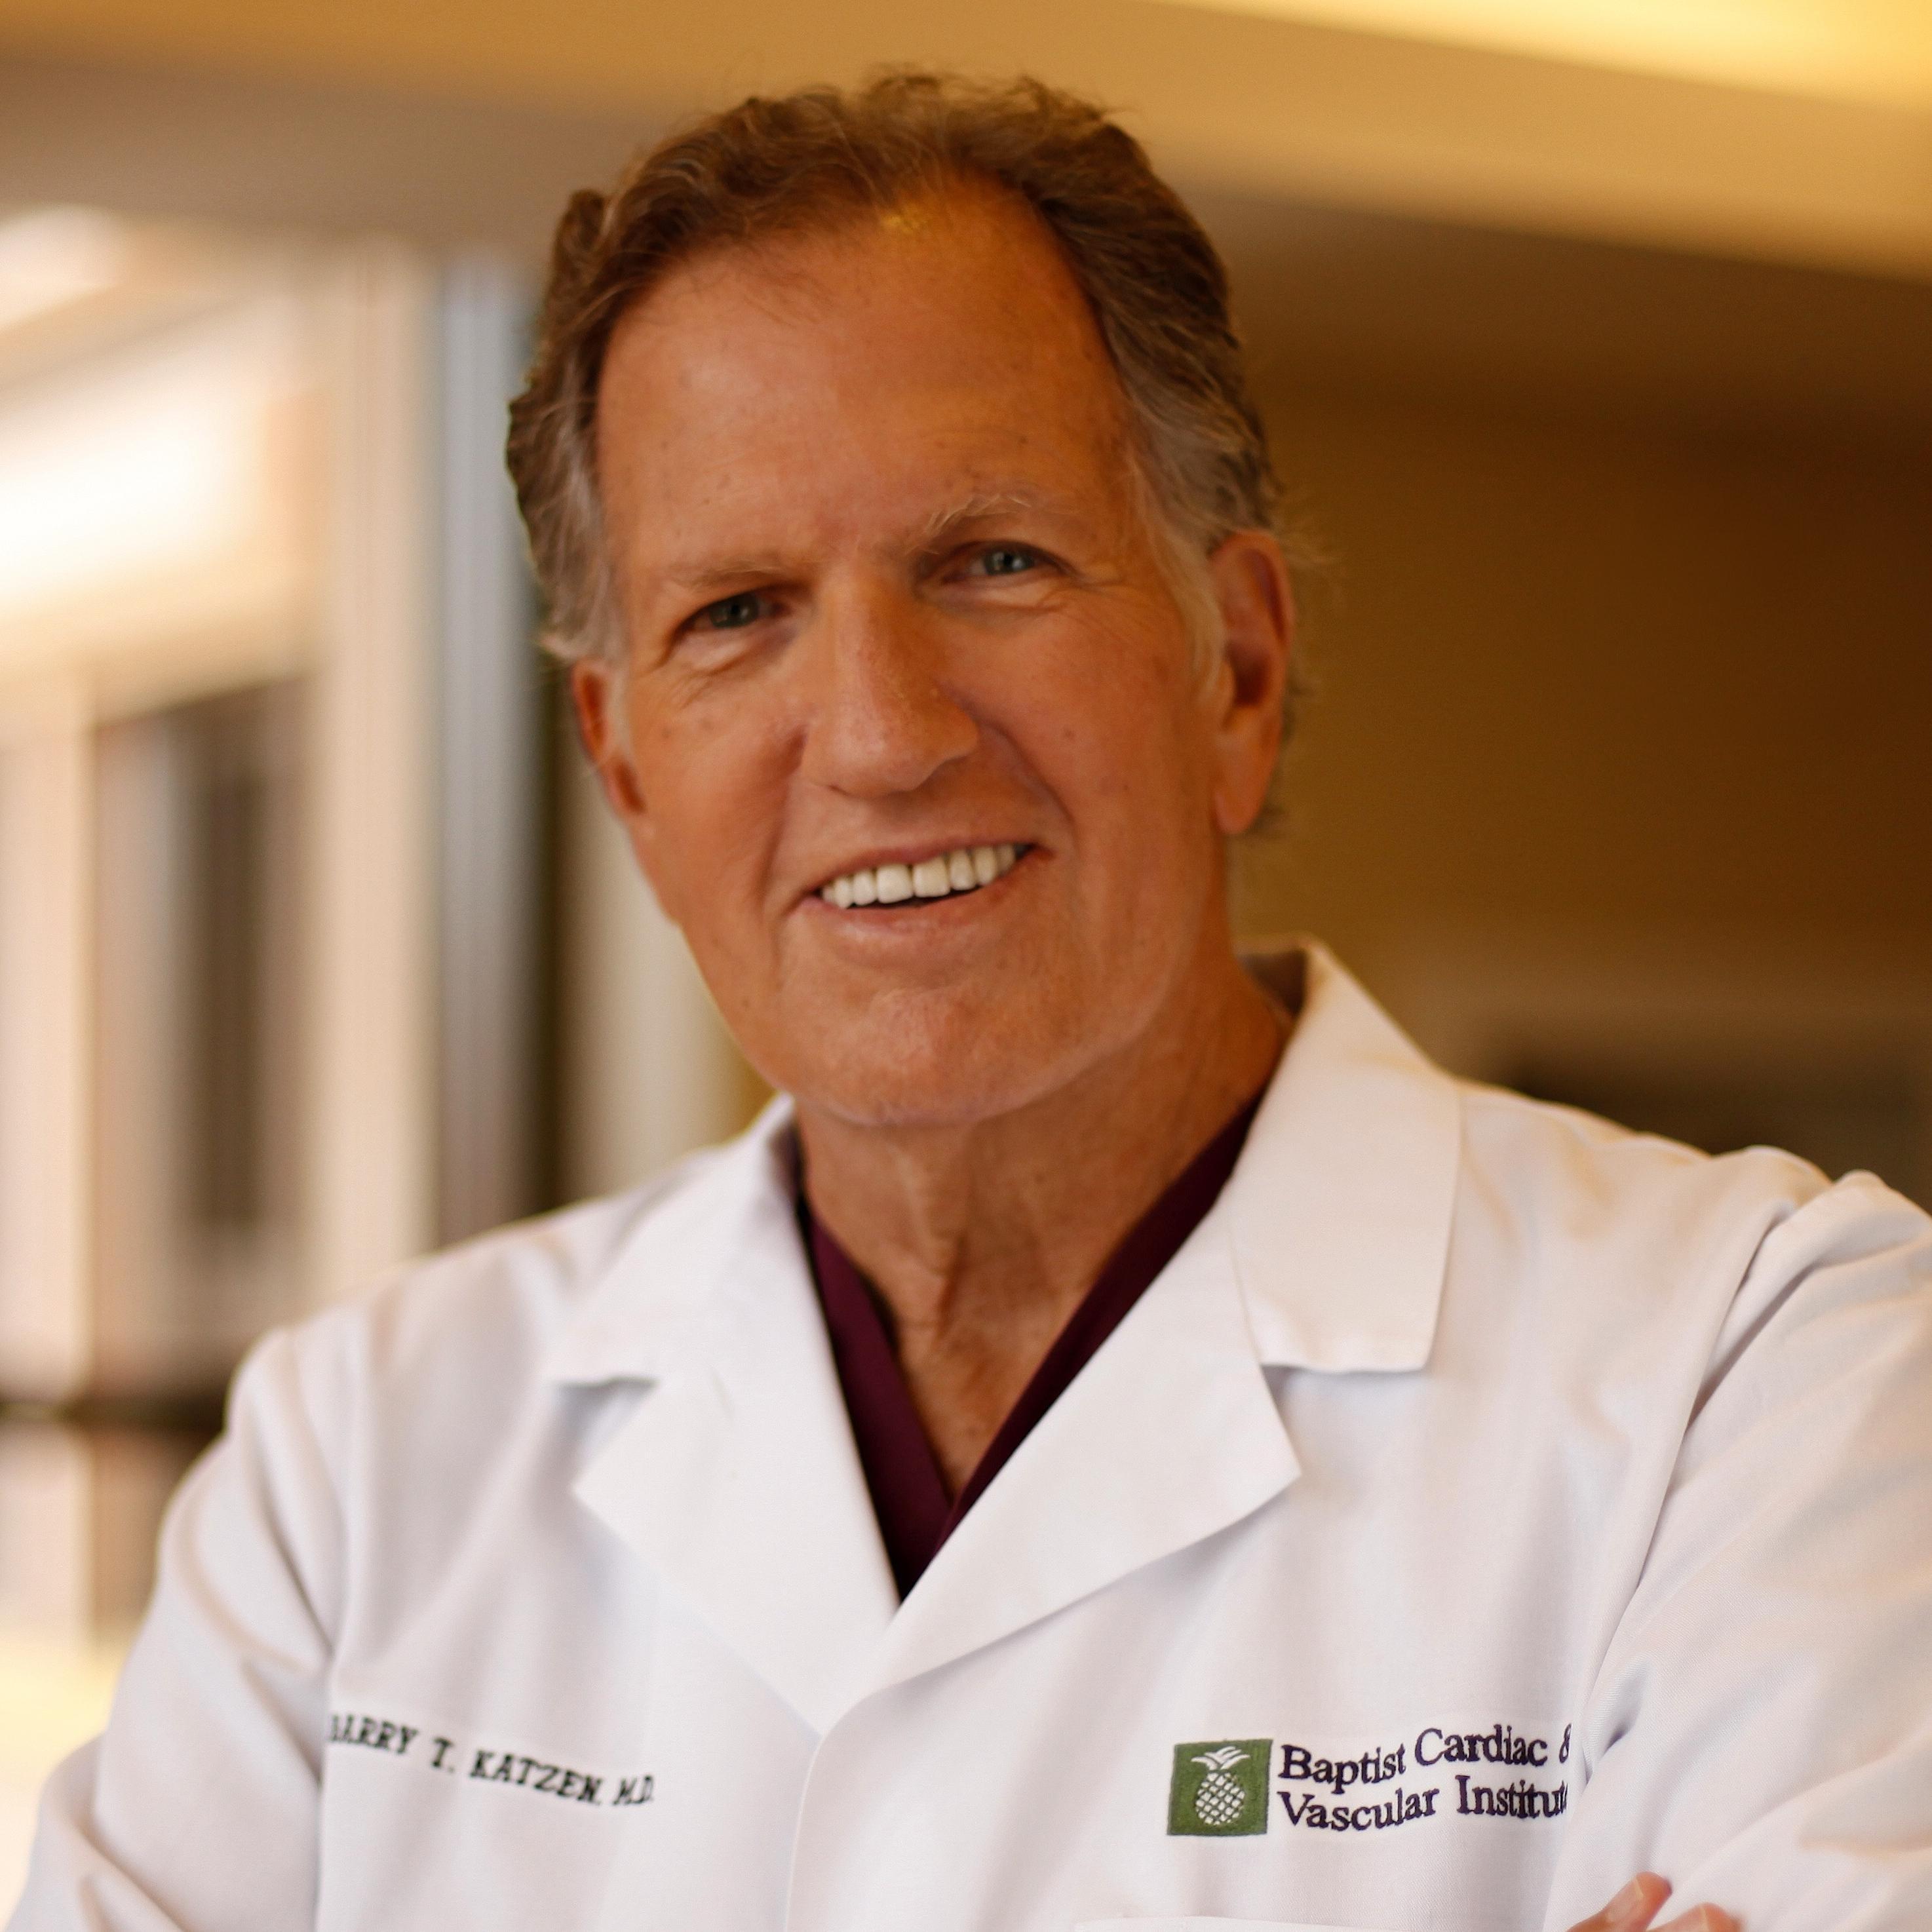 Barry T. Katzen, MD